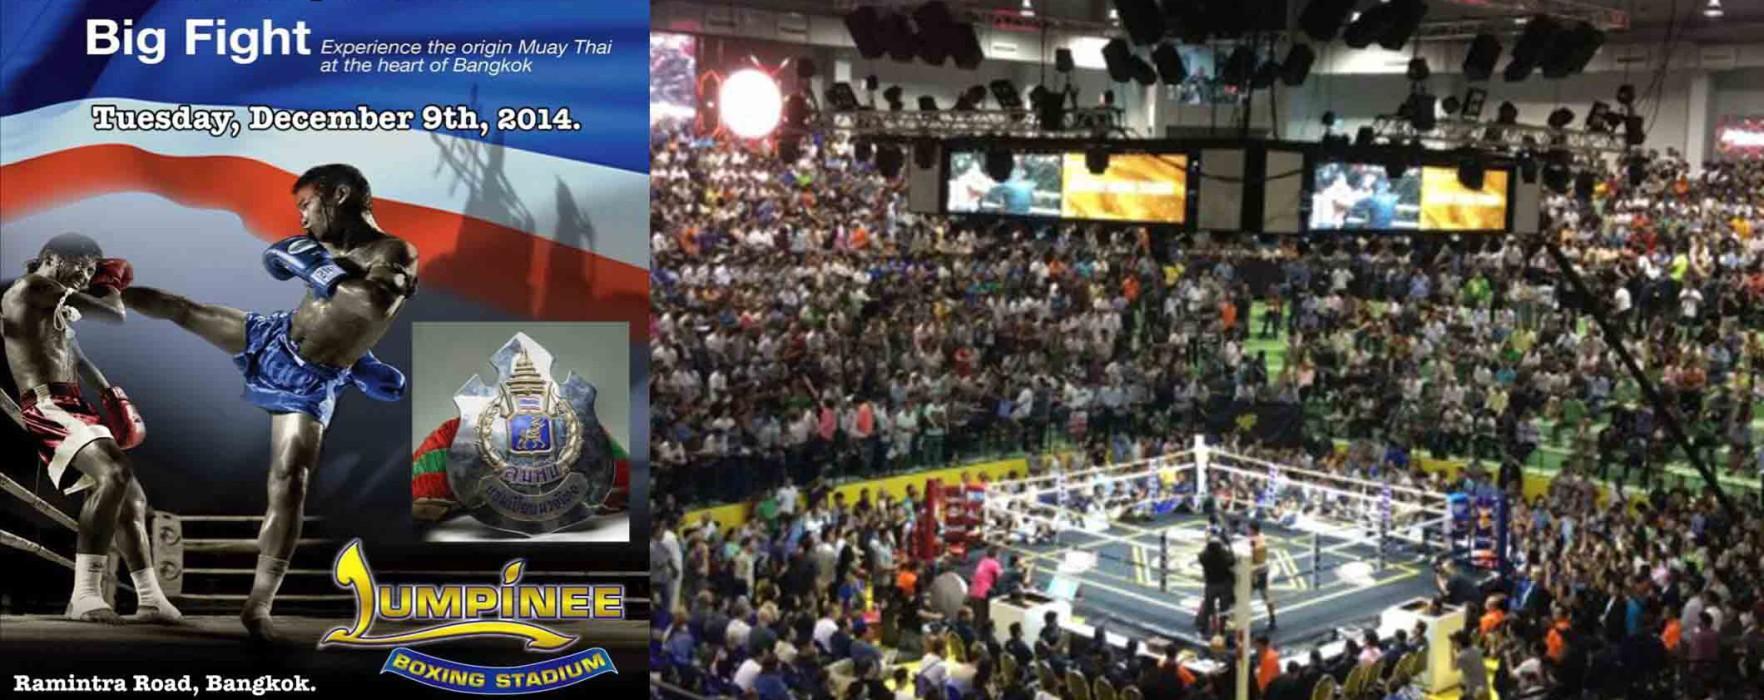 Live results: Krekkrai Lumpinee Champions Superfights – 9/12/2014